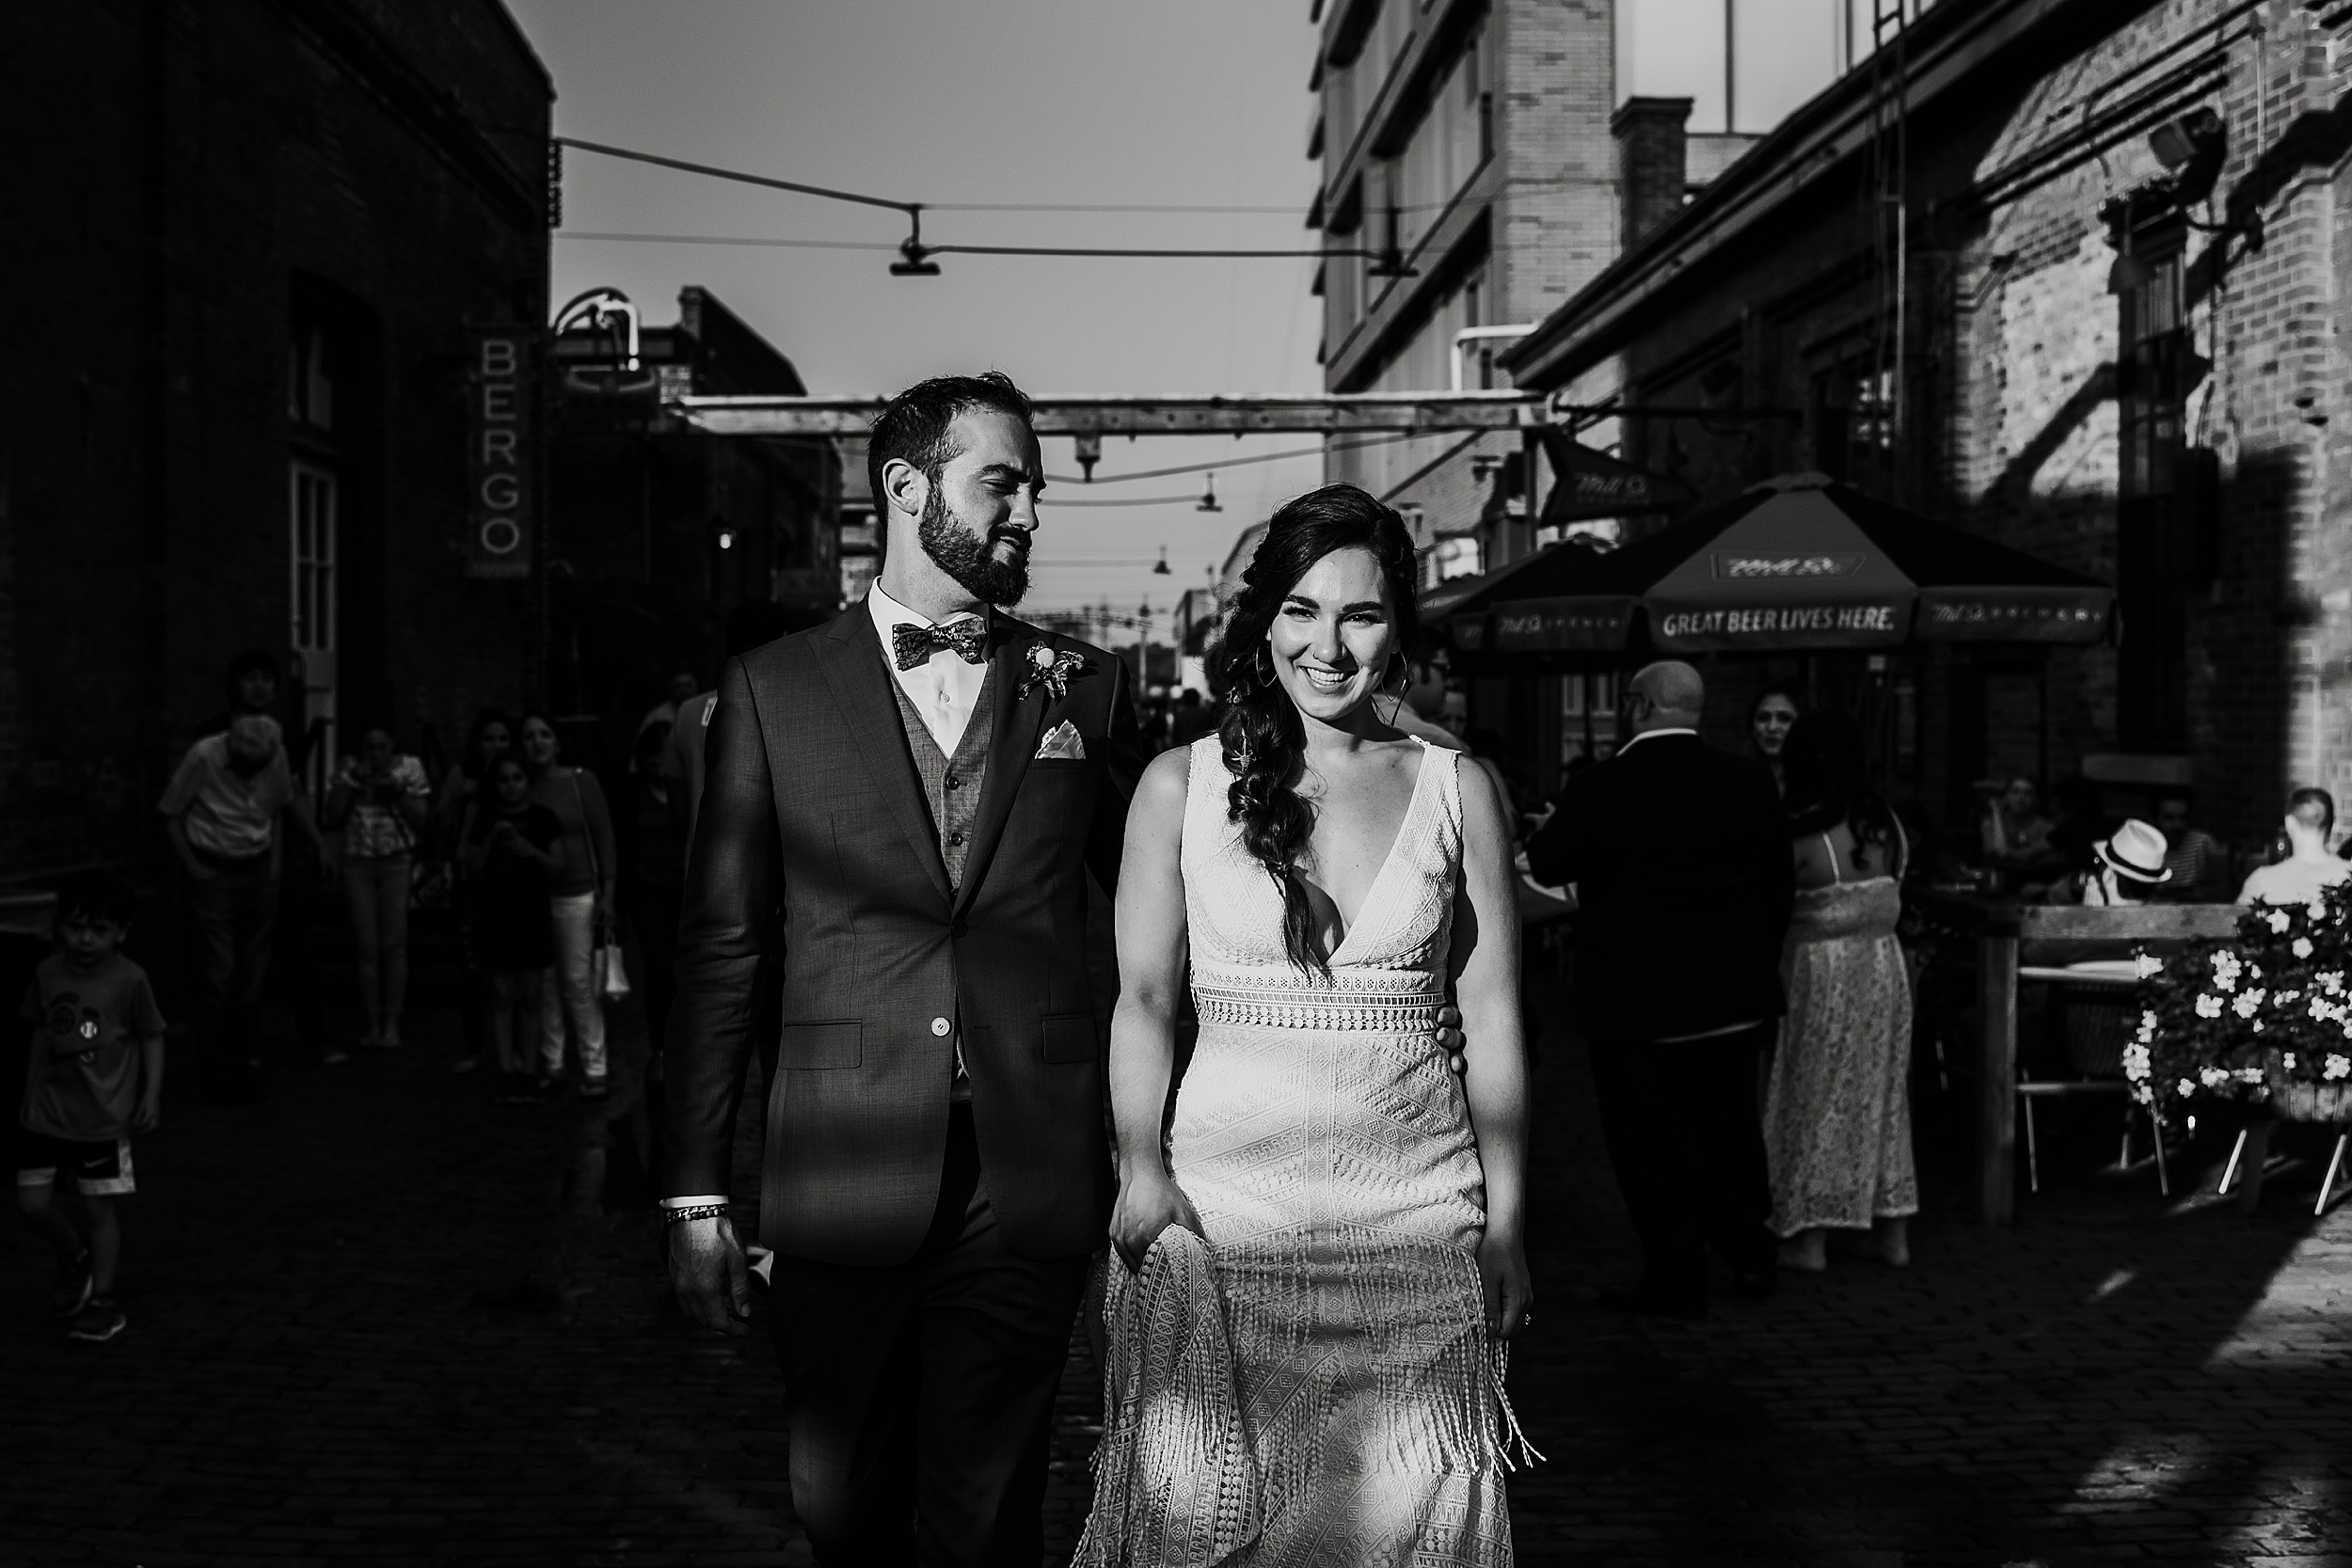 Airship-37-Berkeley-Events-Distillery-District-Wedding-Toronto-Wedding-Photographers_0044.jpg